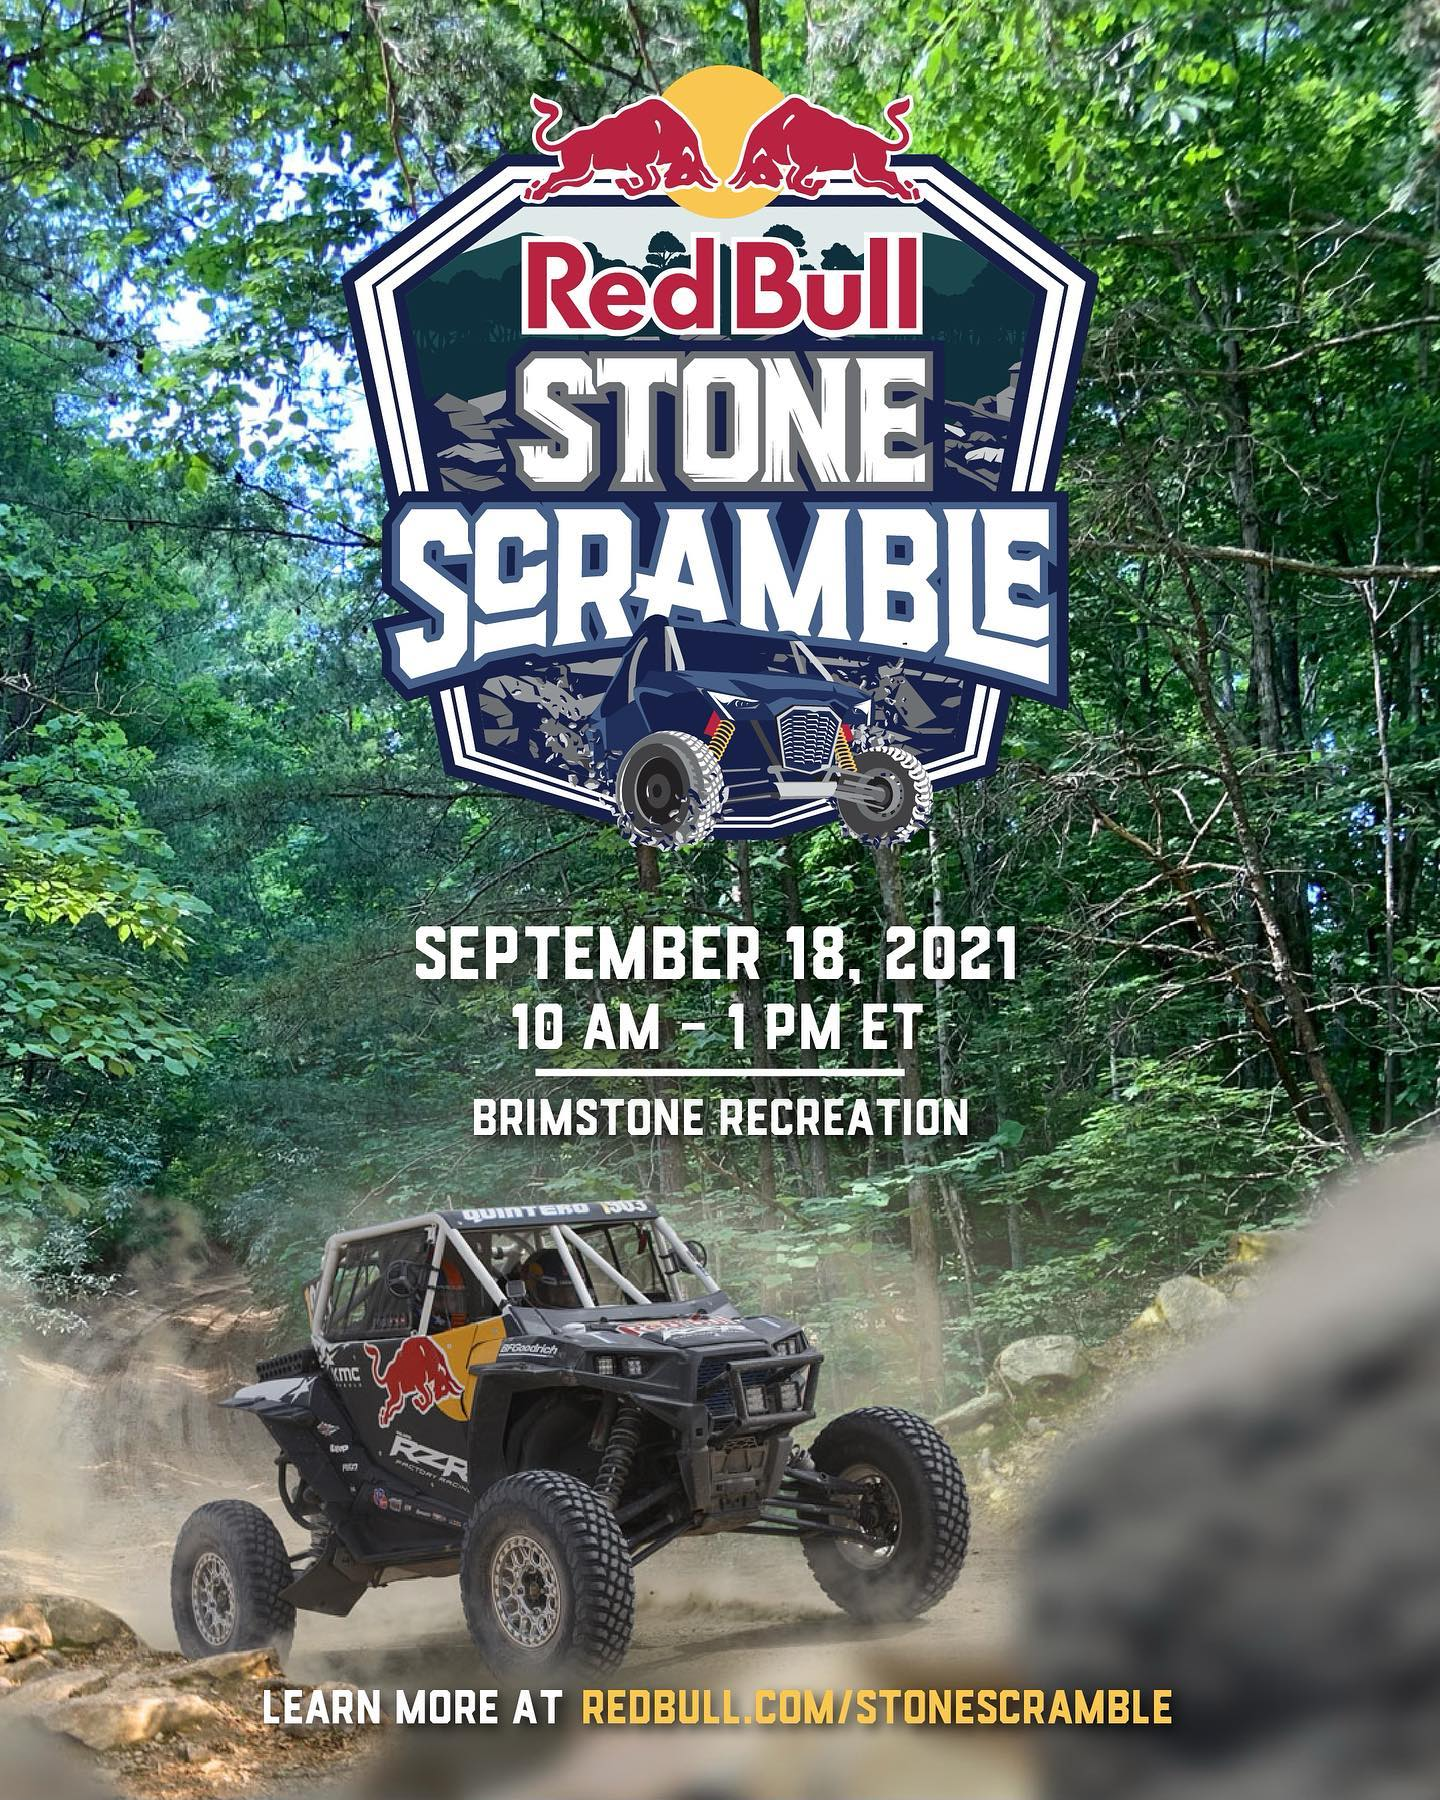 Red Bull Stone Scramble at Brimstone